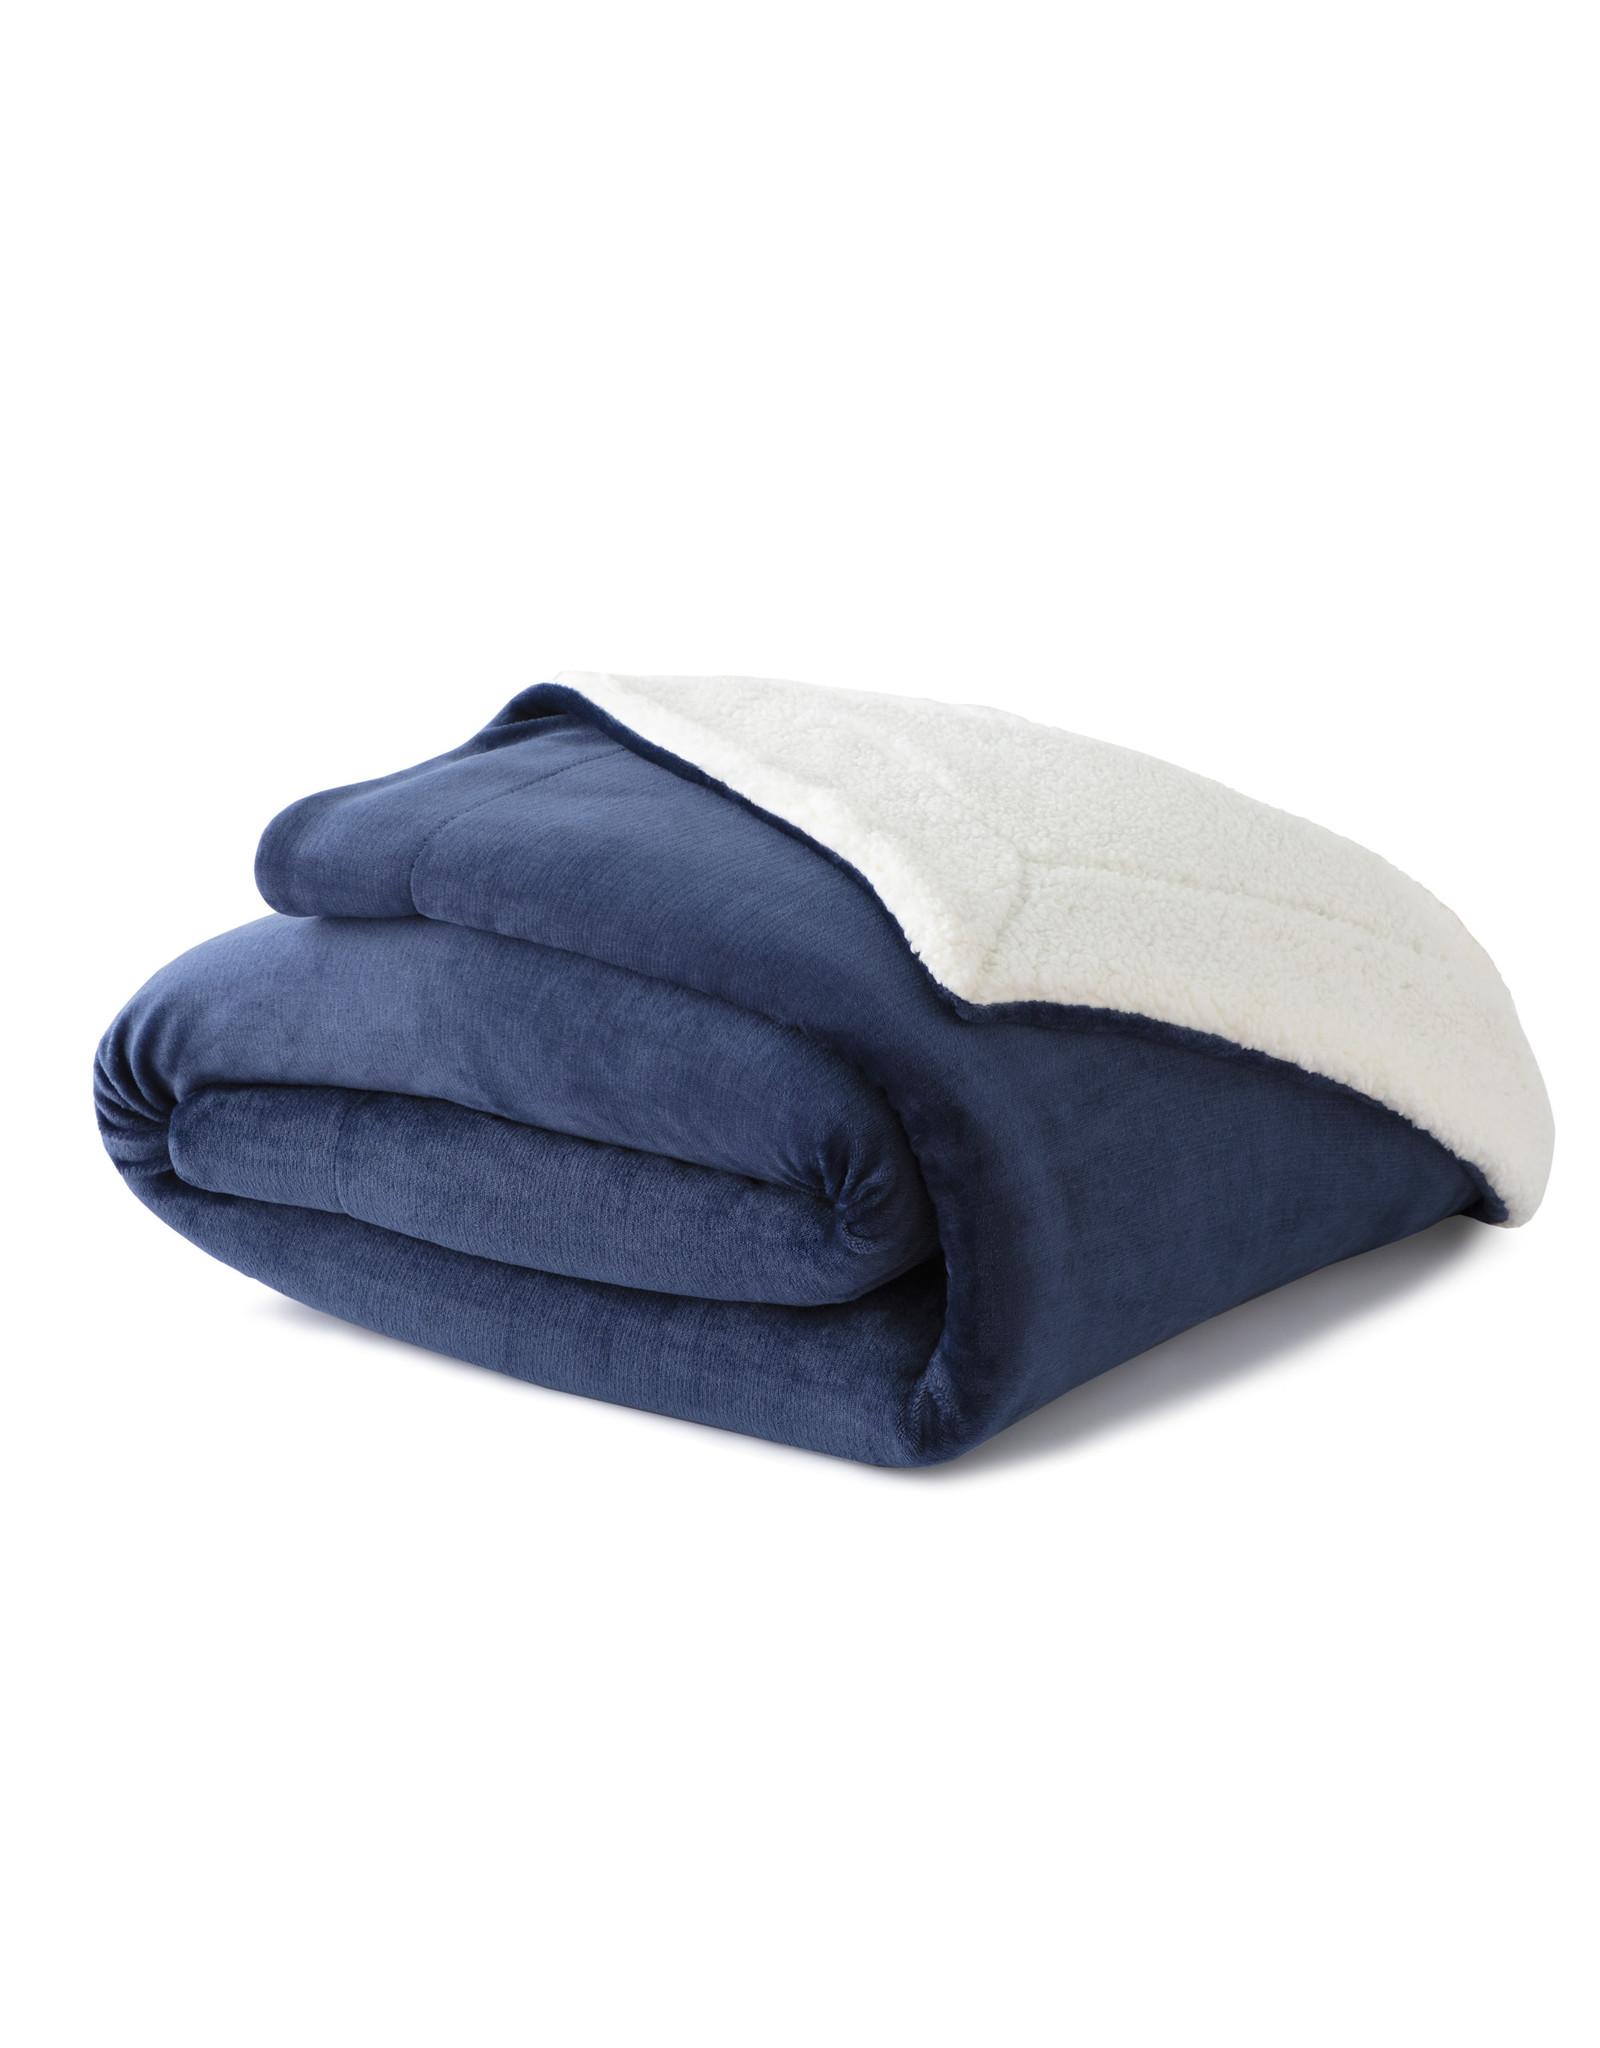 Woven WK5060 Throw Sherpa Blanket Blue